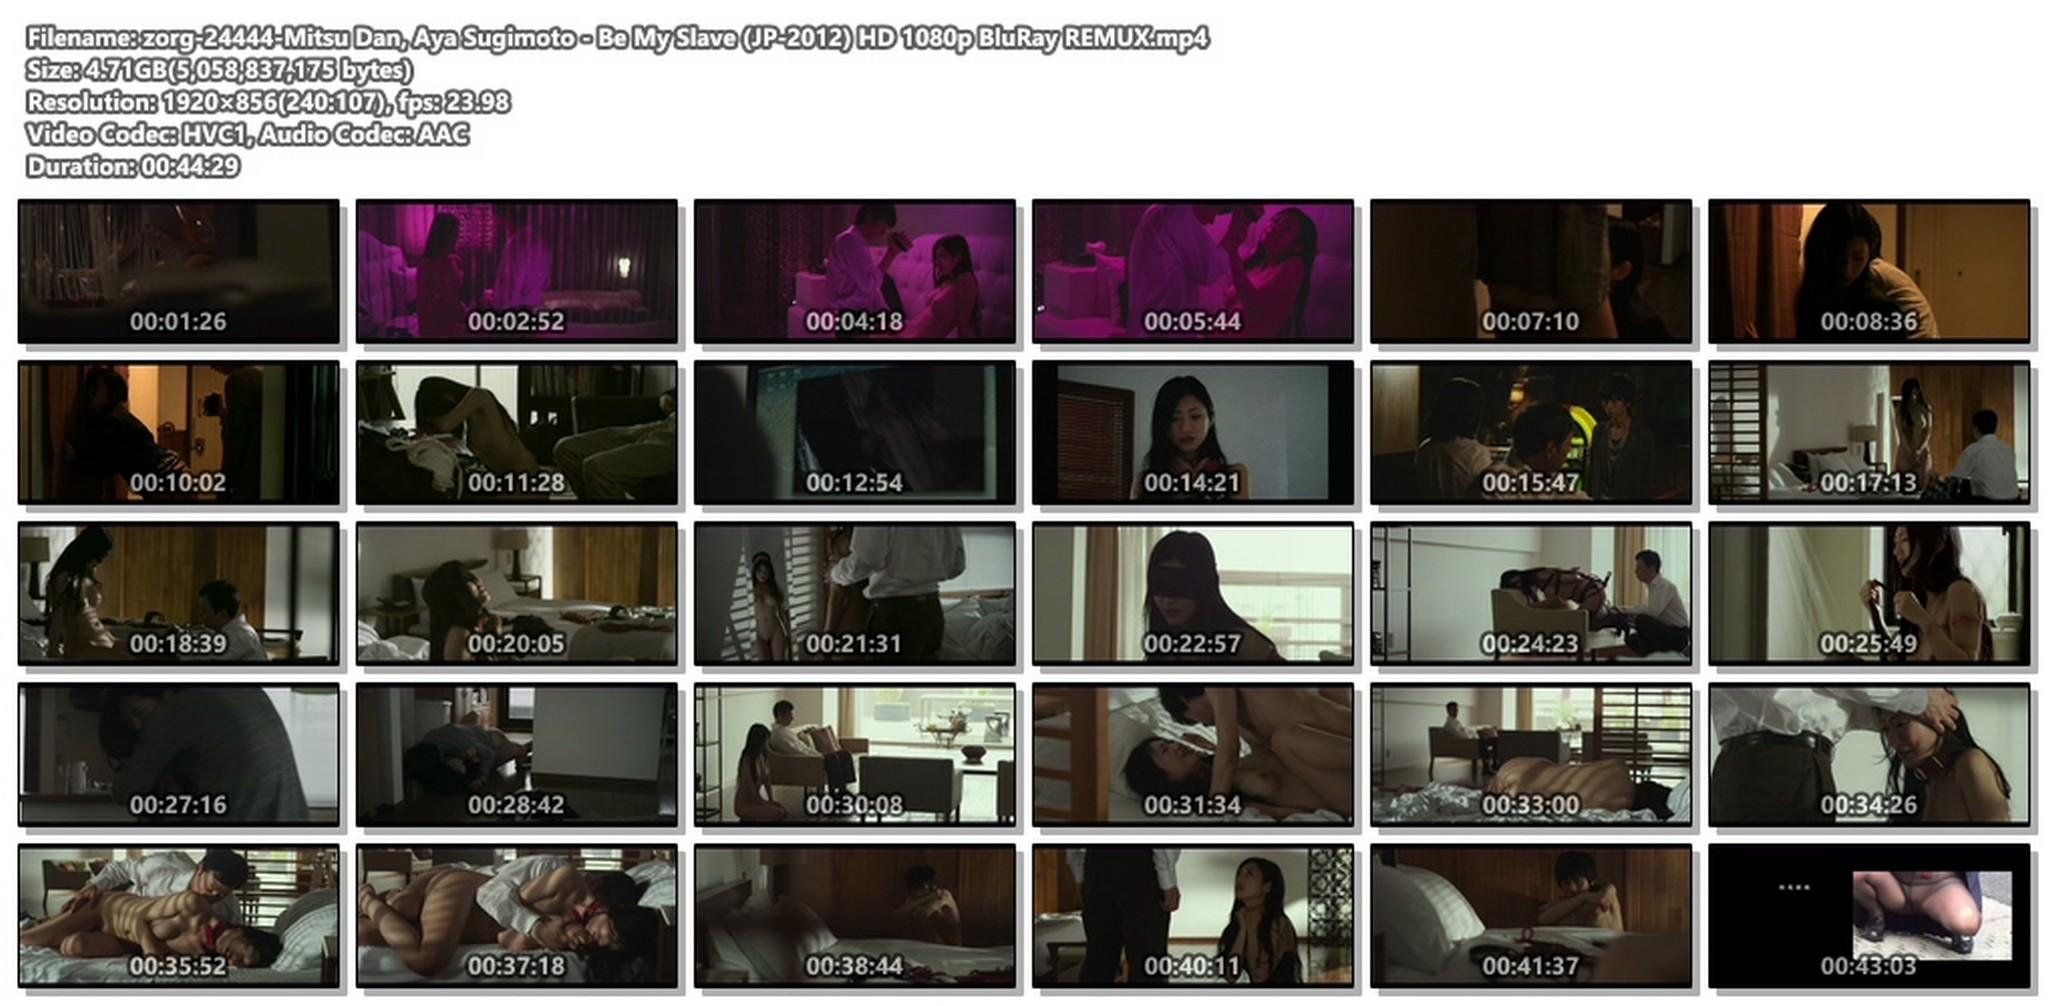 Mitsu Dan nude hot sex Be My Slave JP 2012 HD 1080p BluRay REMUX 019